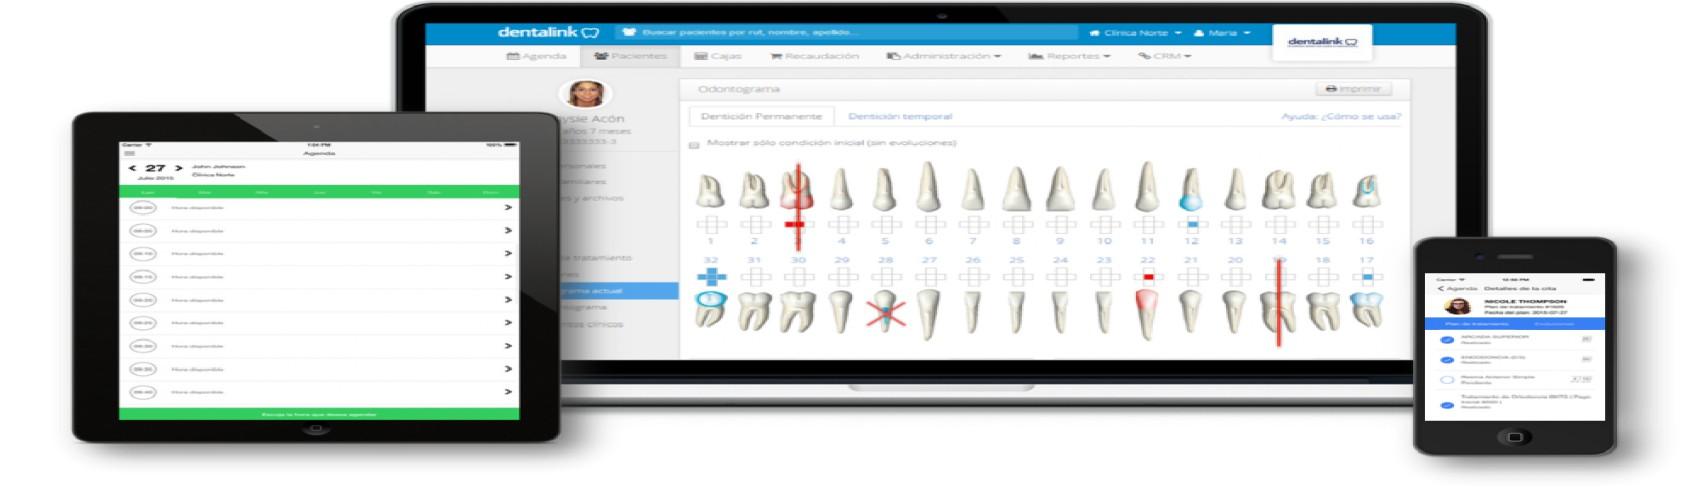 Dentalink, software para clínicas dentales